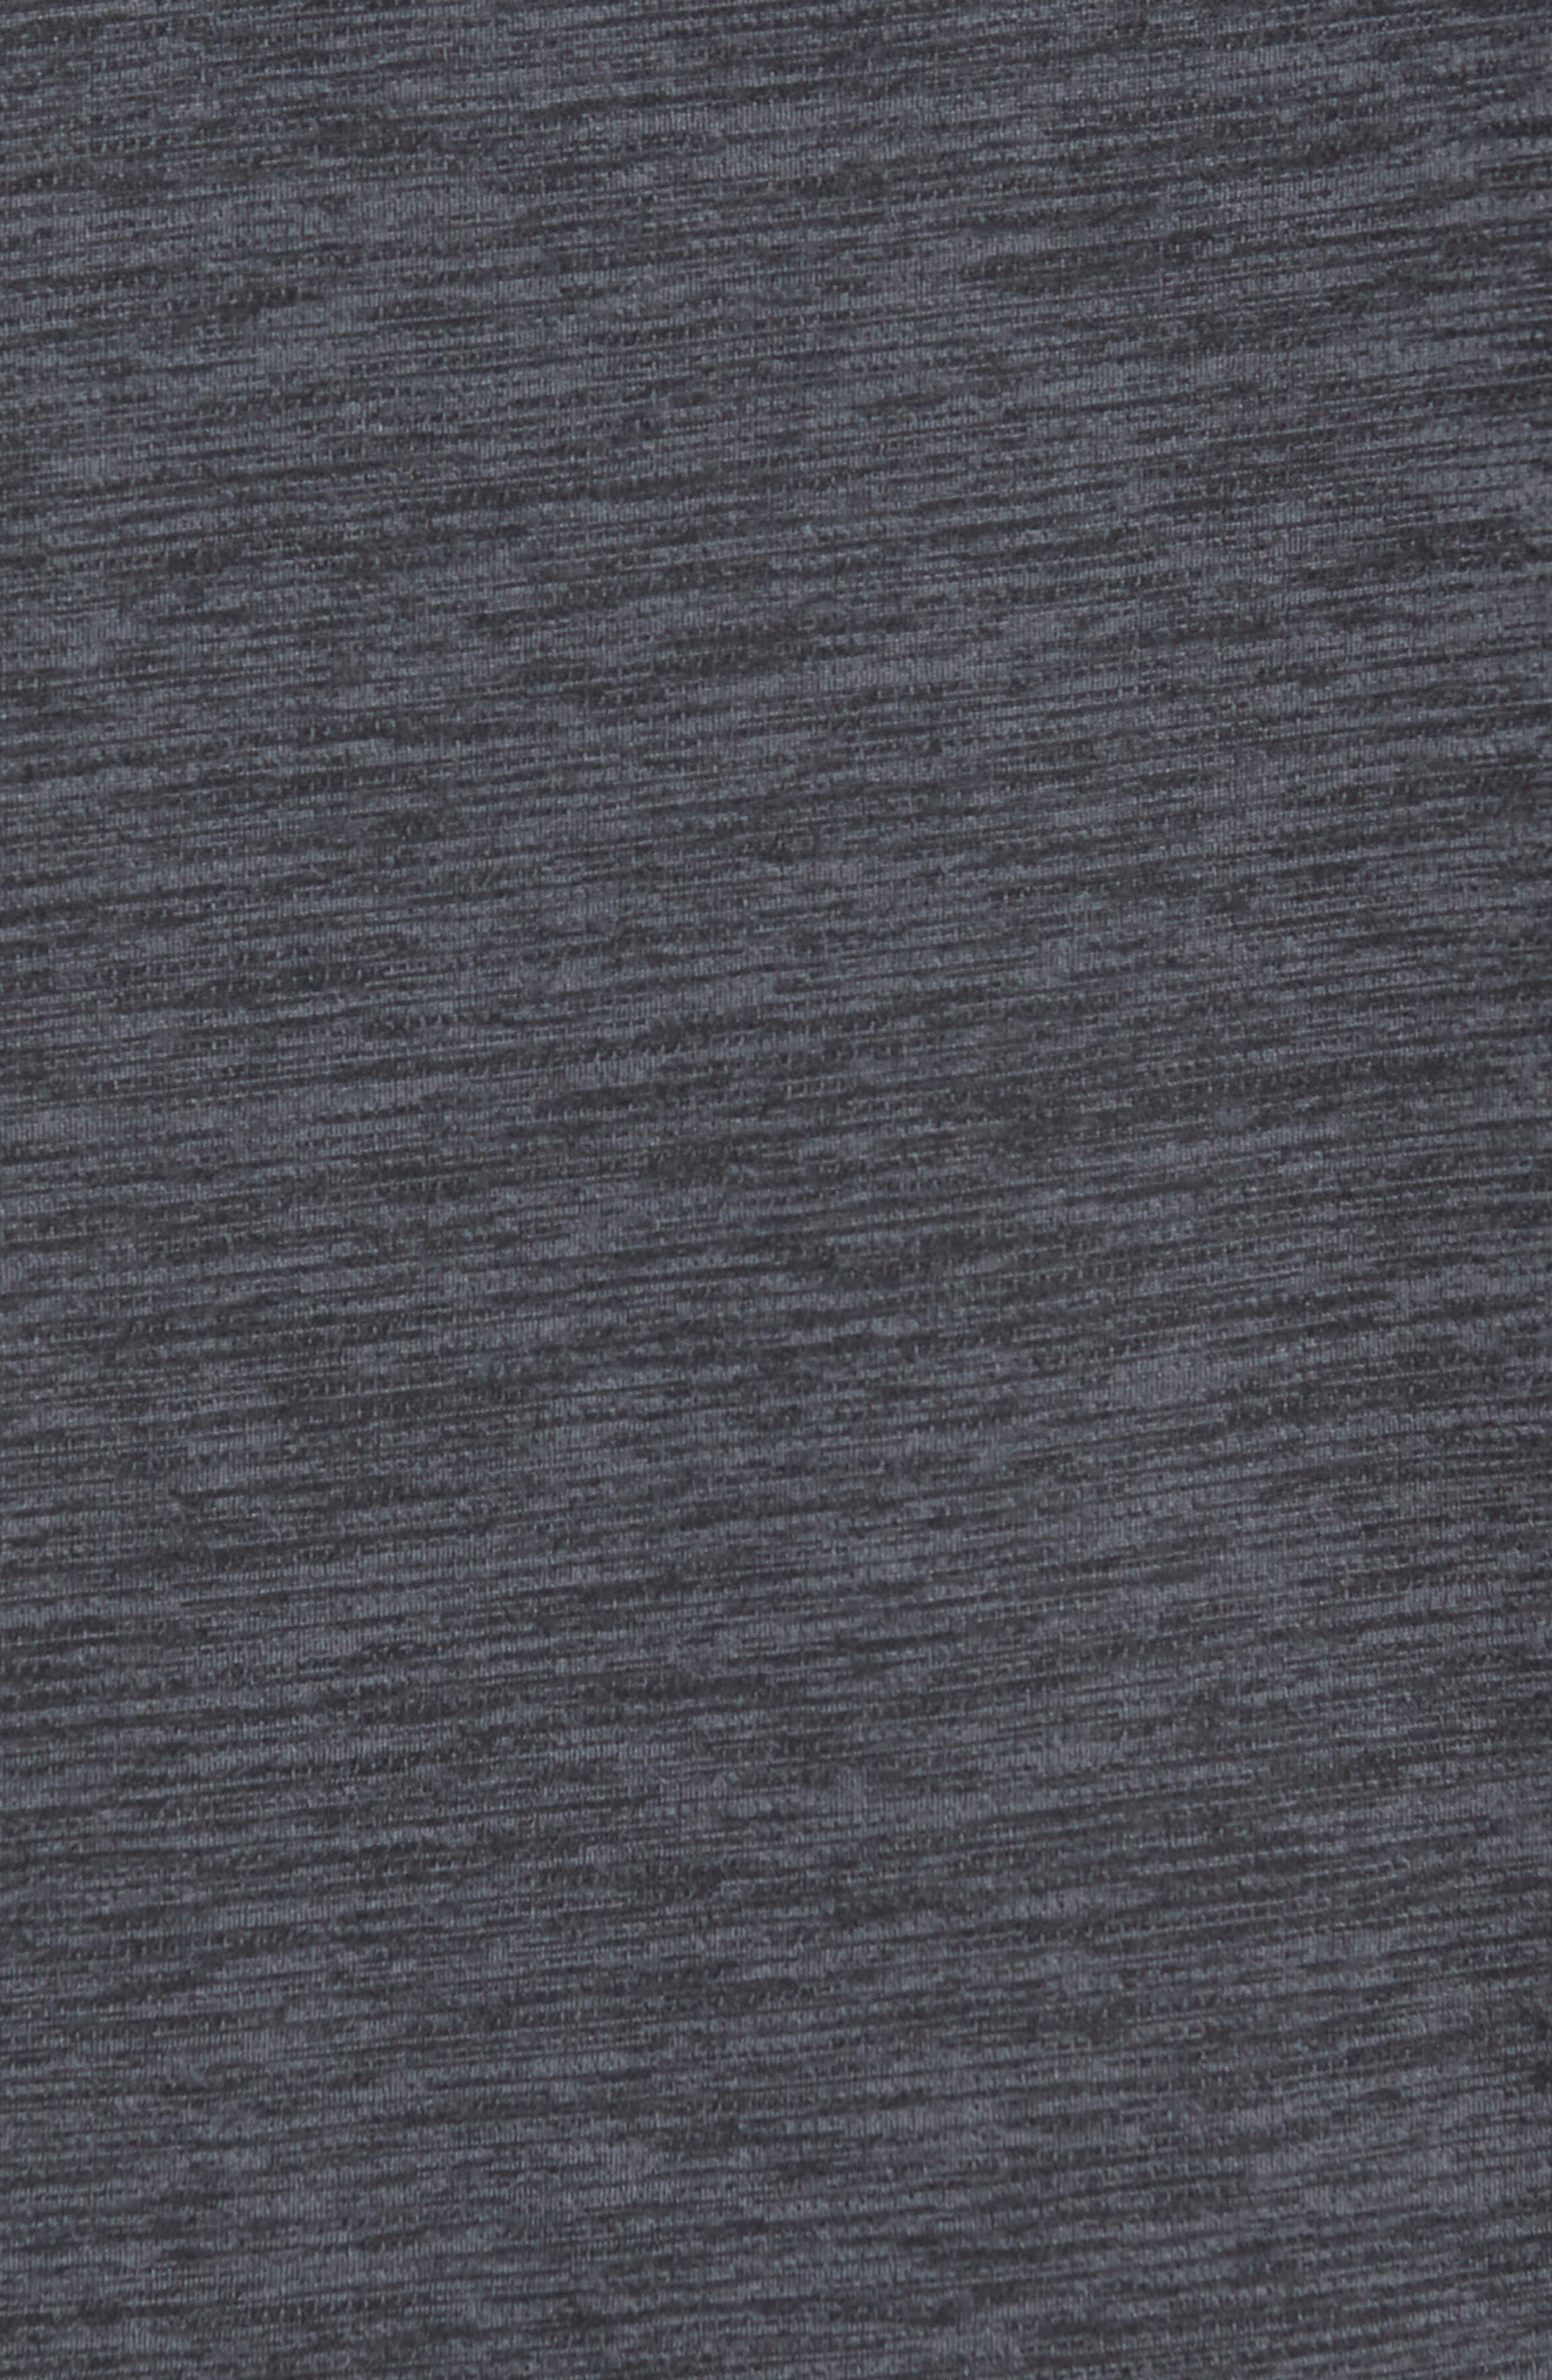 Kinoite Raglan Crewneck T-Shirt,                             Alternate thumbnail 5, color,                             GREY OBSIDIAN MELANGE